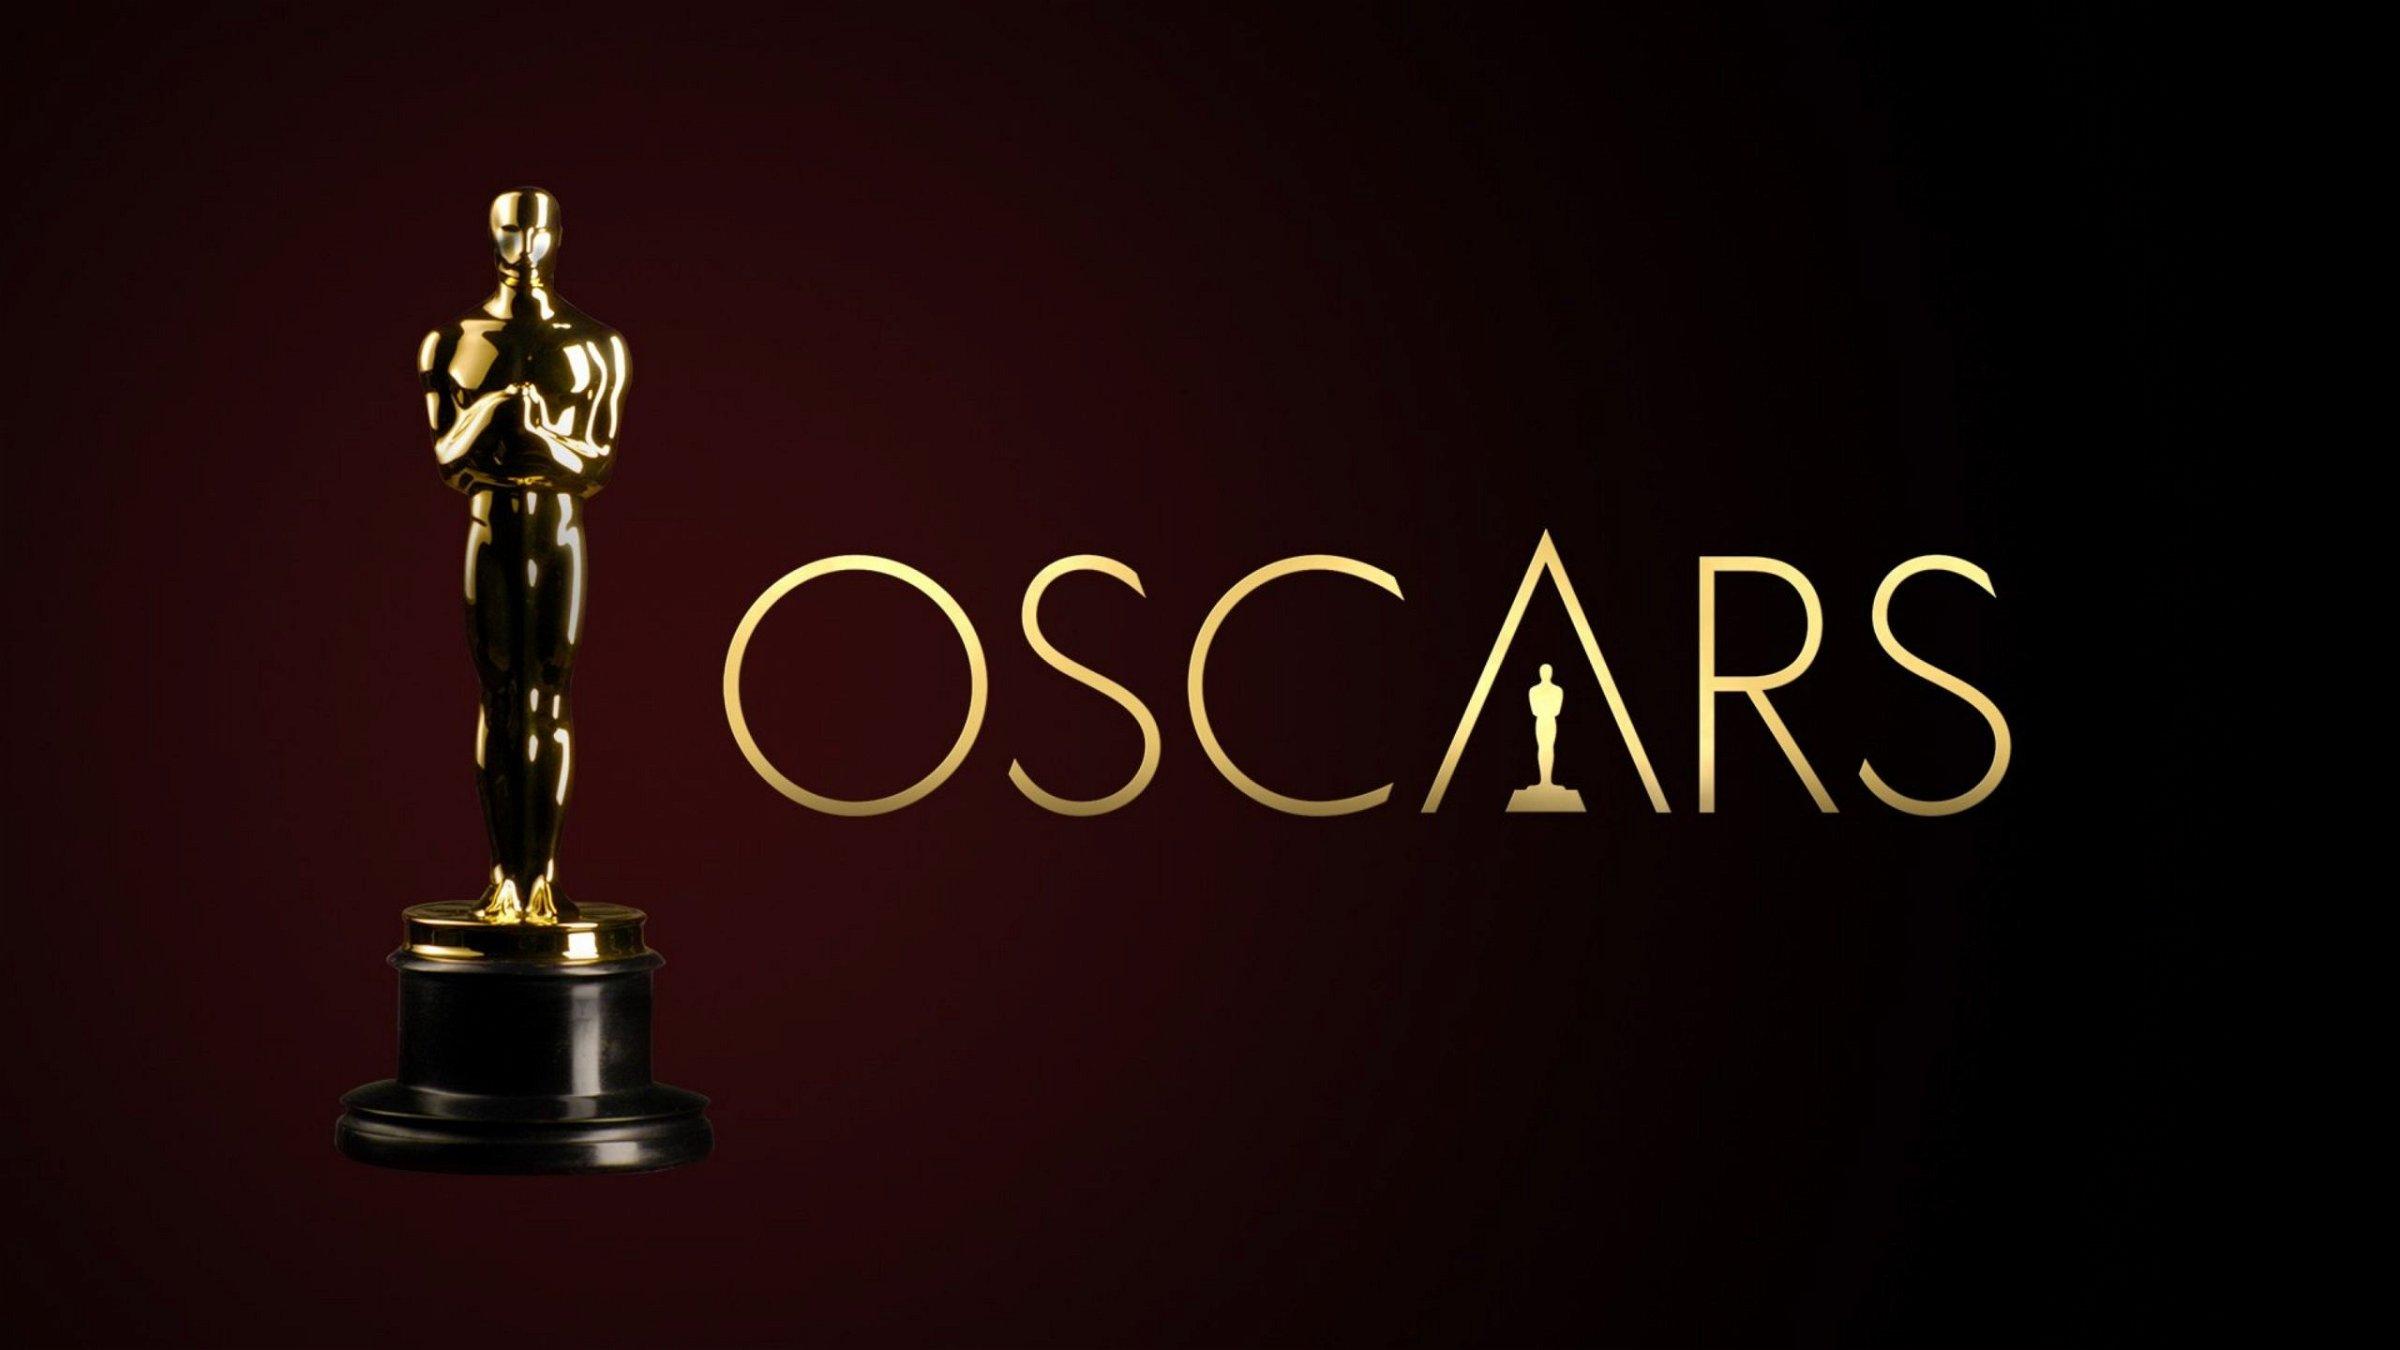 Oscars 2021 Shortlists Announced In Nine Award Categories